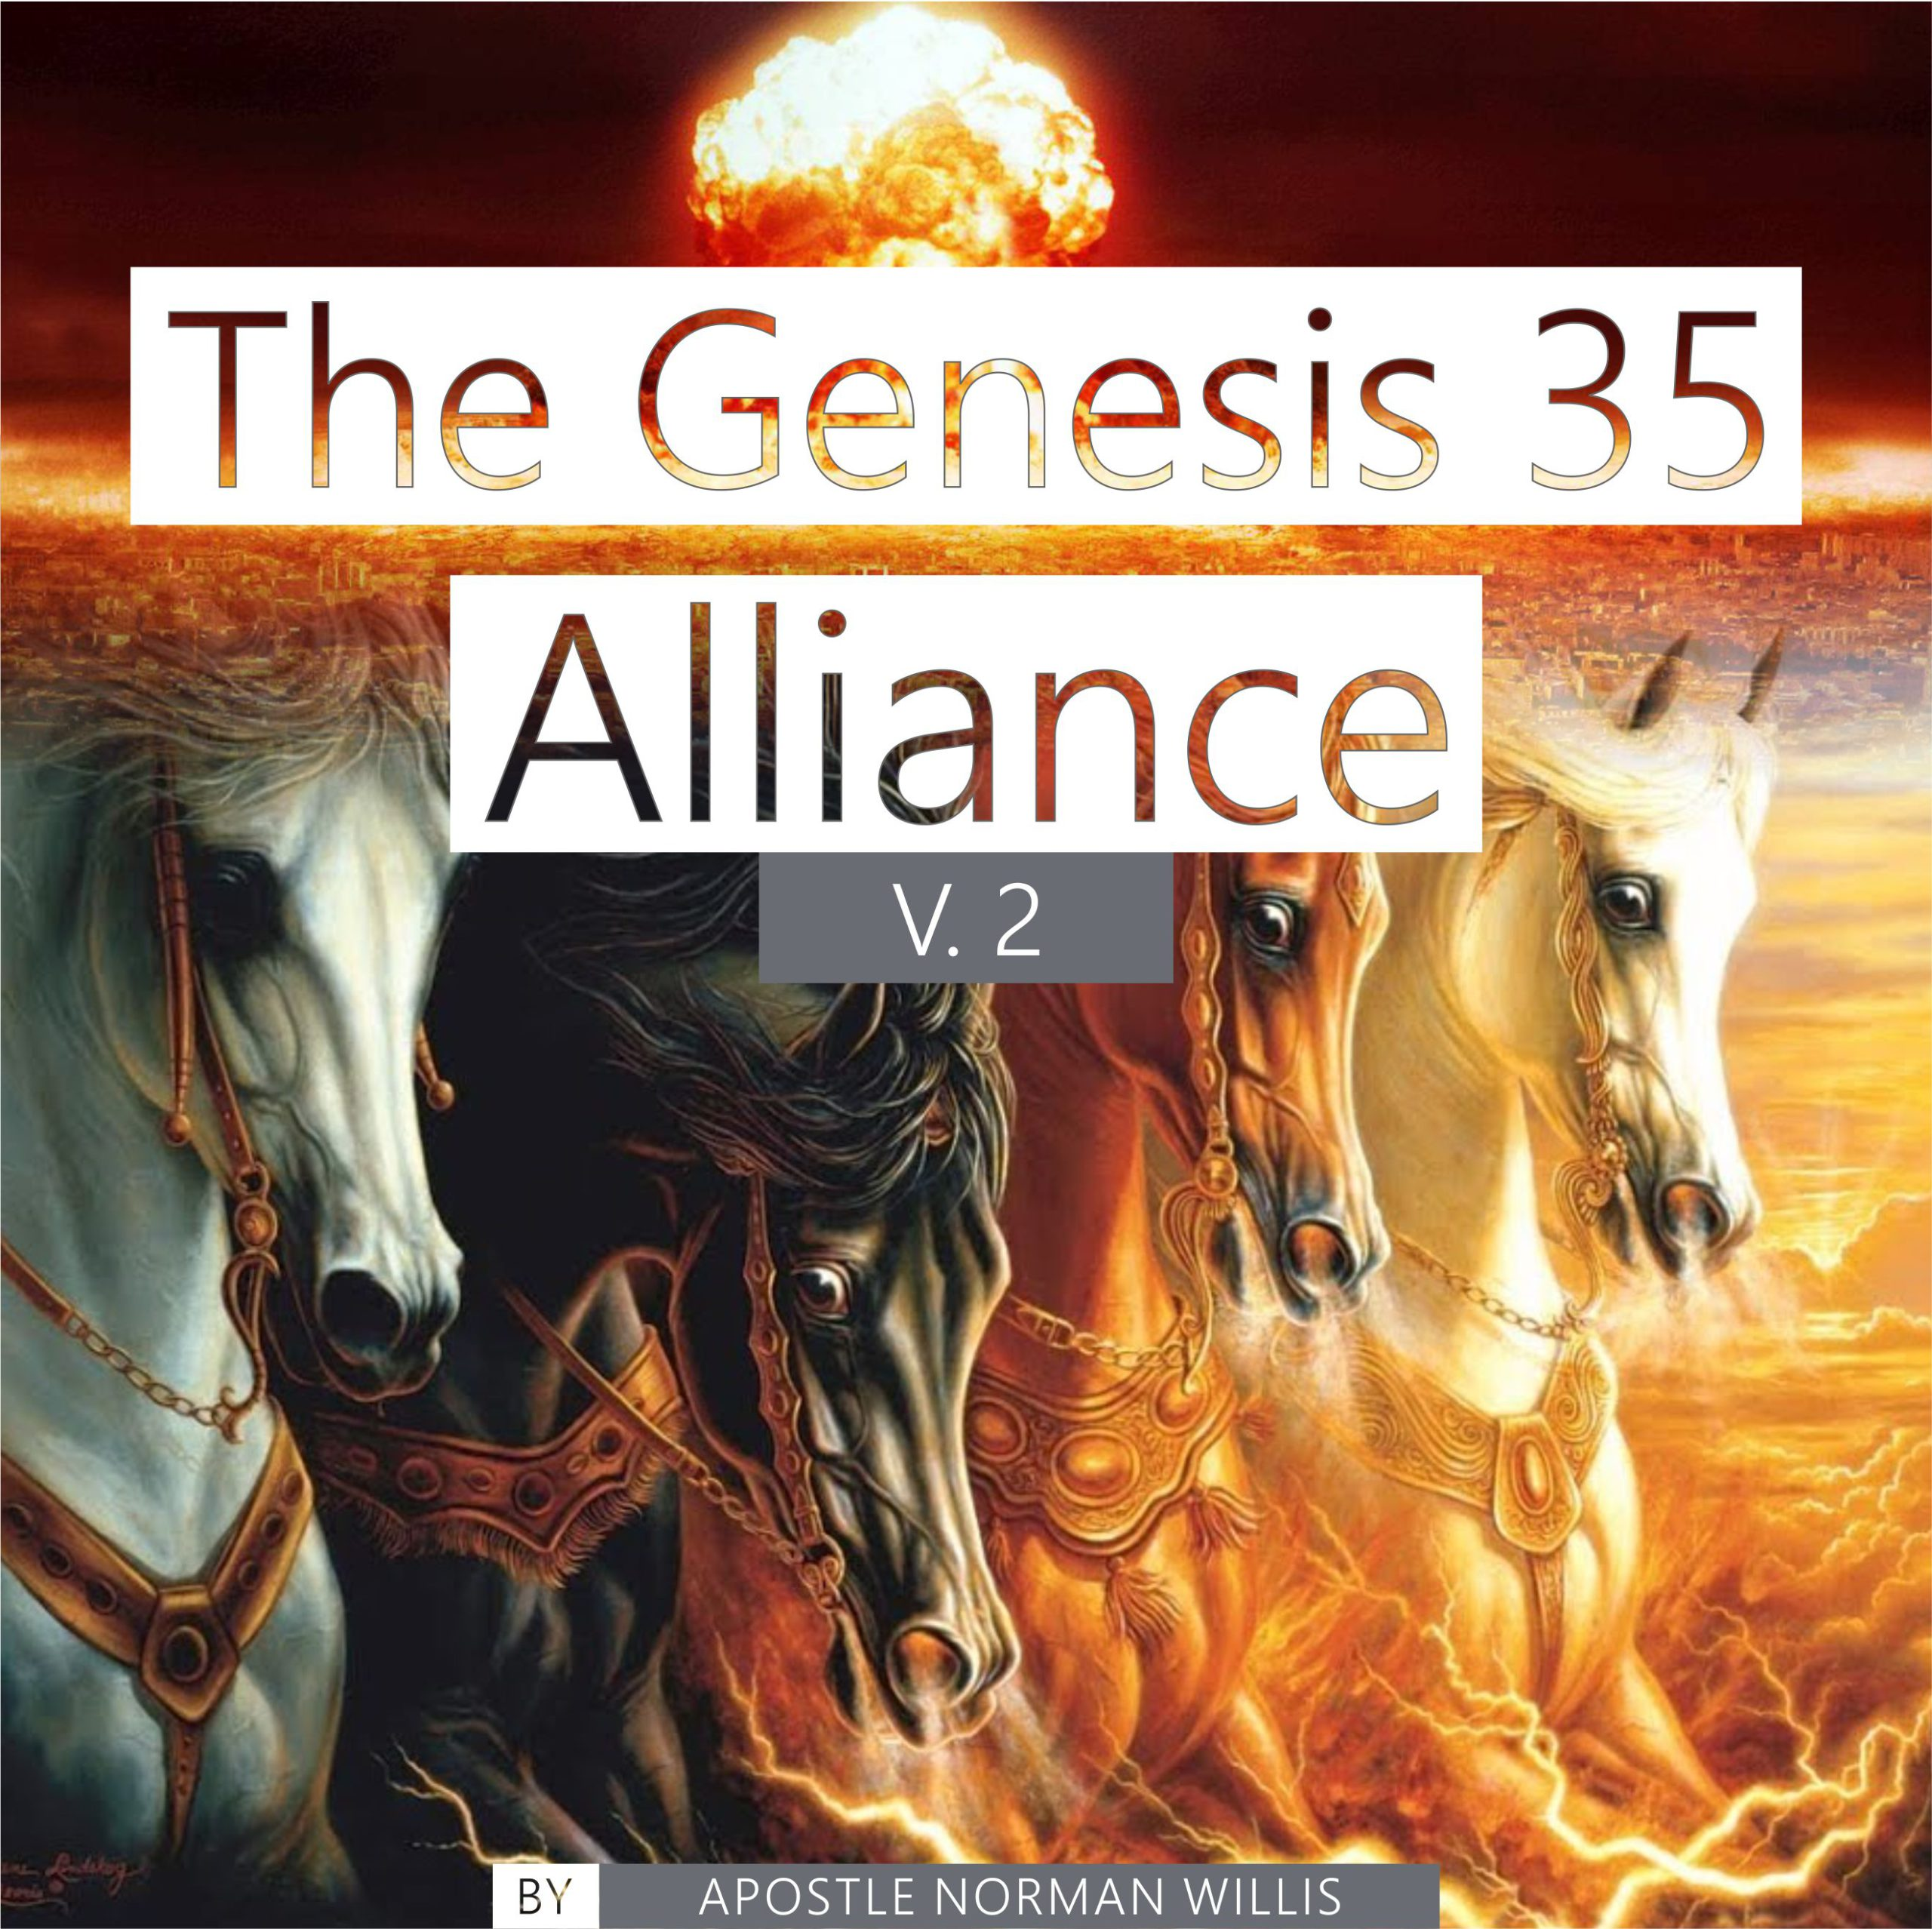 The Genesis 35 Alliance v2